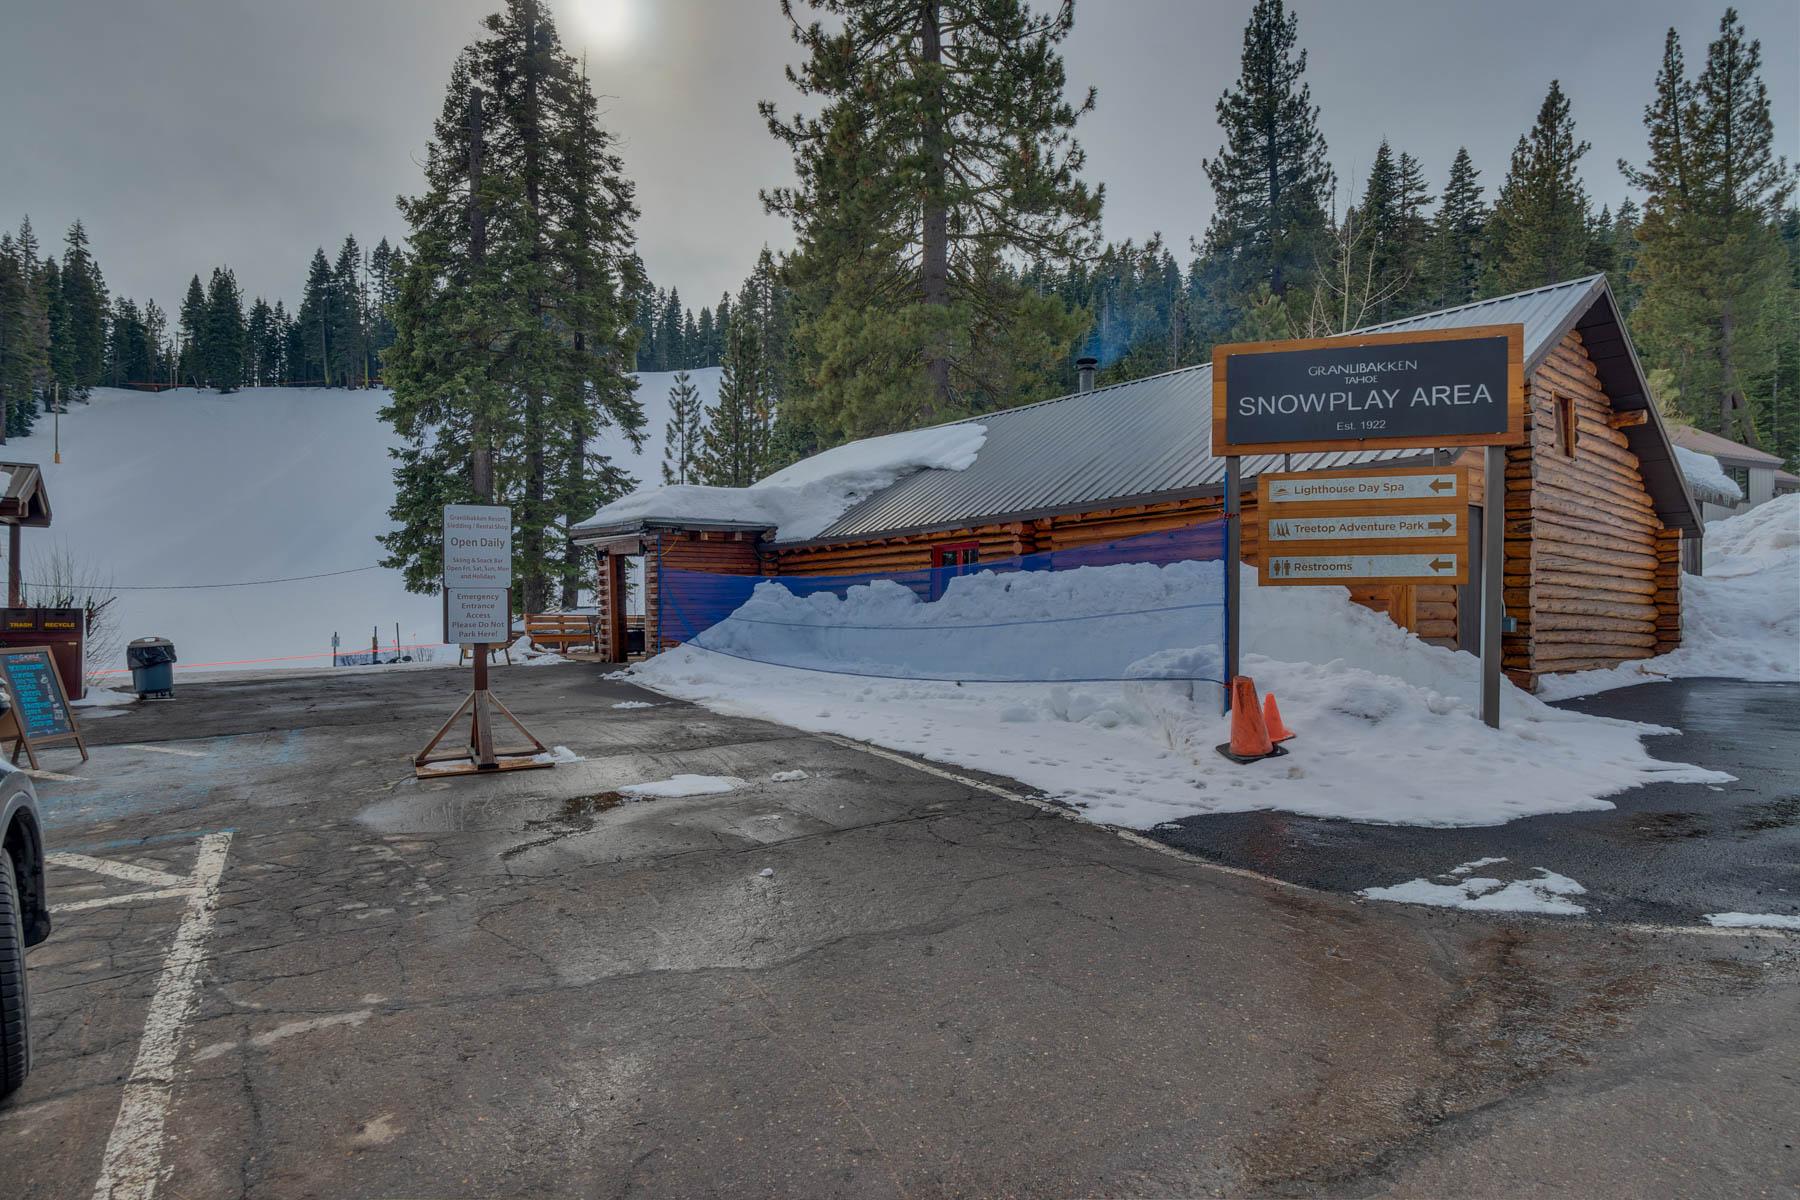 Additional photo for property listing at 725 Granlibakken Road Unit#8 CityTahoe City 725 Granlibakken Rd #81 Tahoe City, California 96145 United States